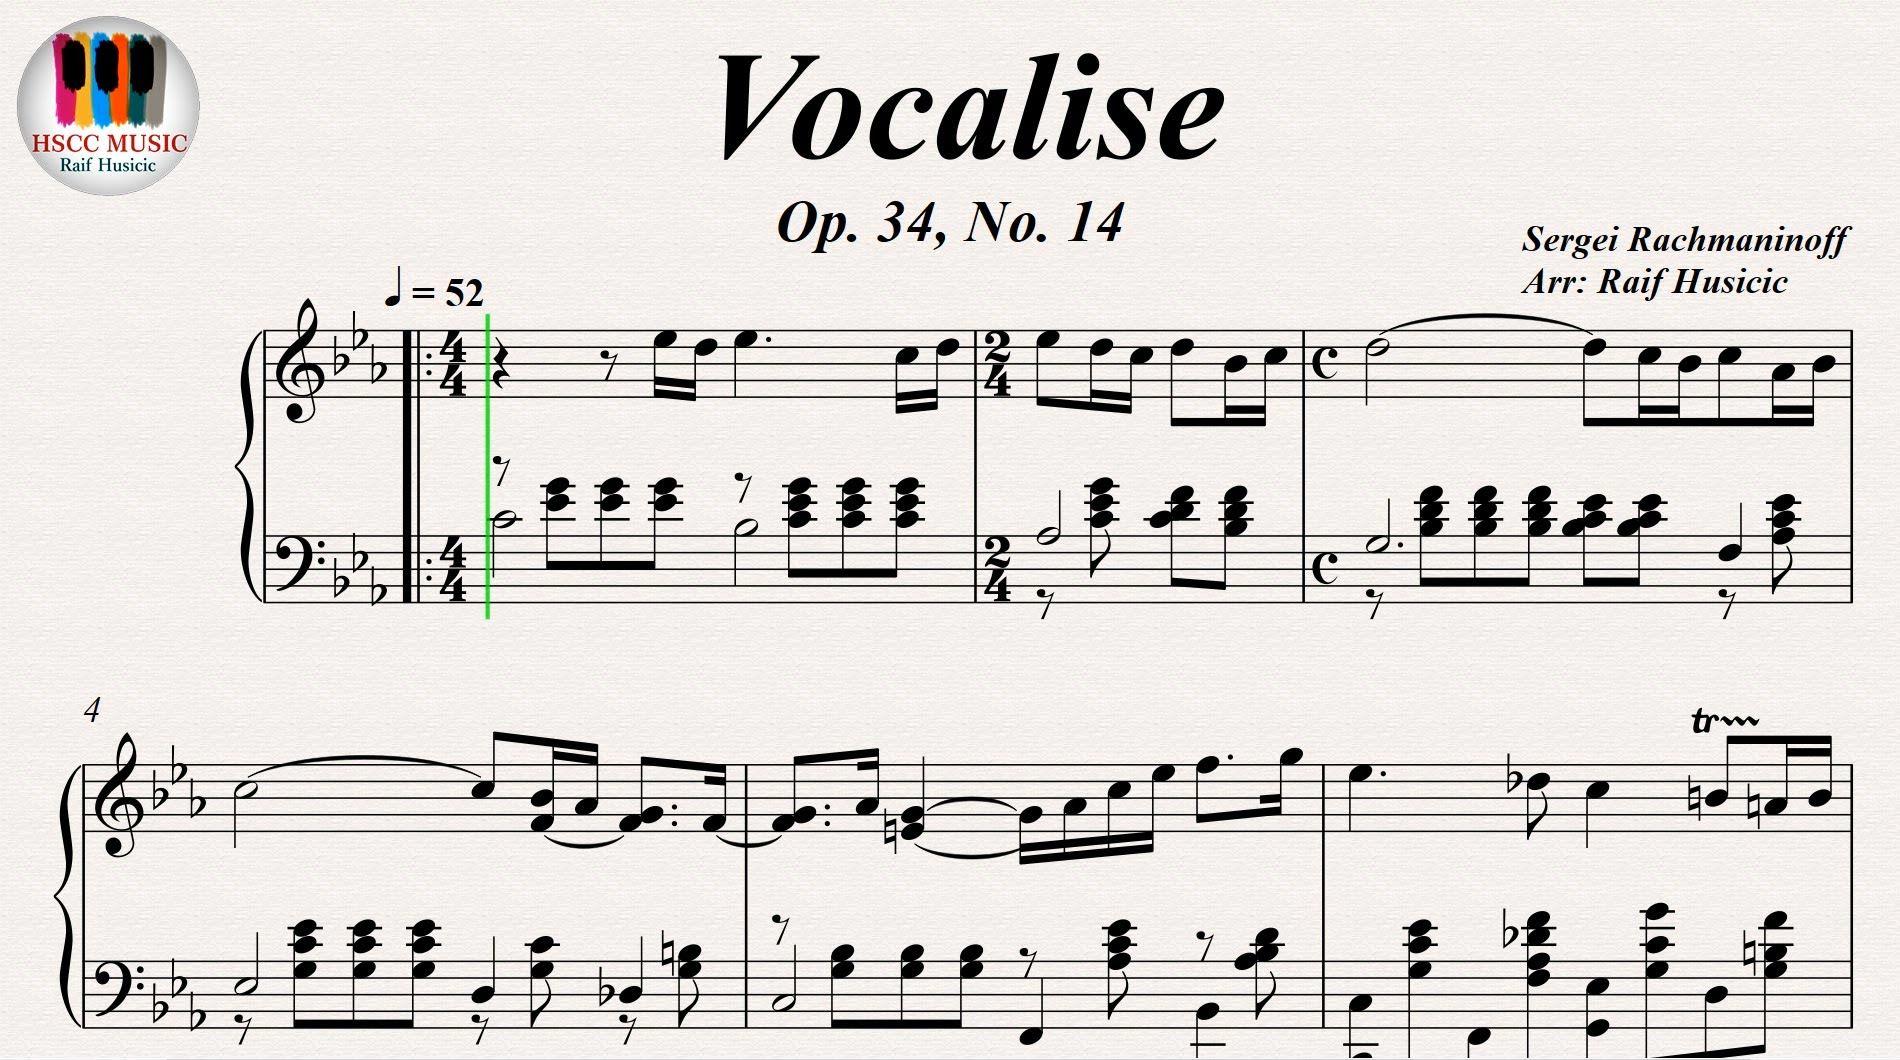 Pin by Reinette du Rand on sheet music   Music, Piano, Sheet